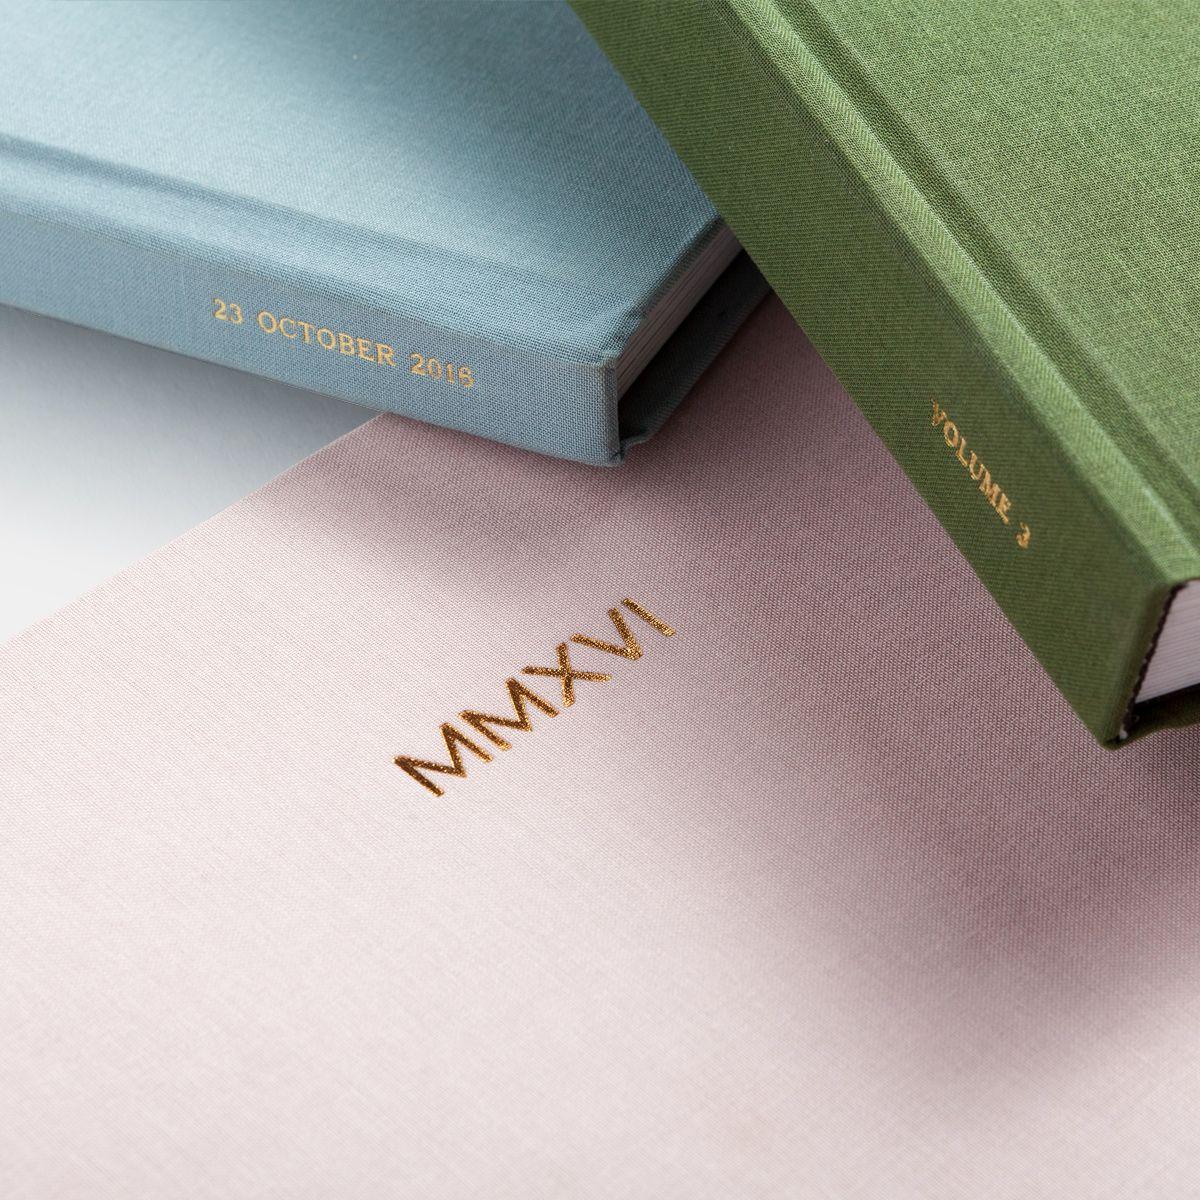 guestbook-main06-foil-details_2x.jpg